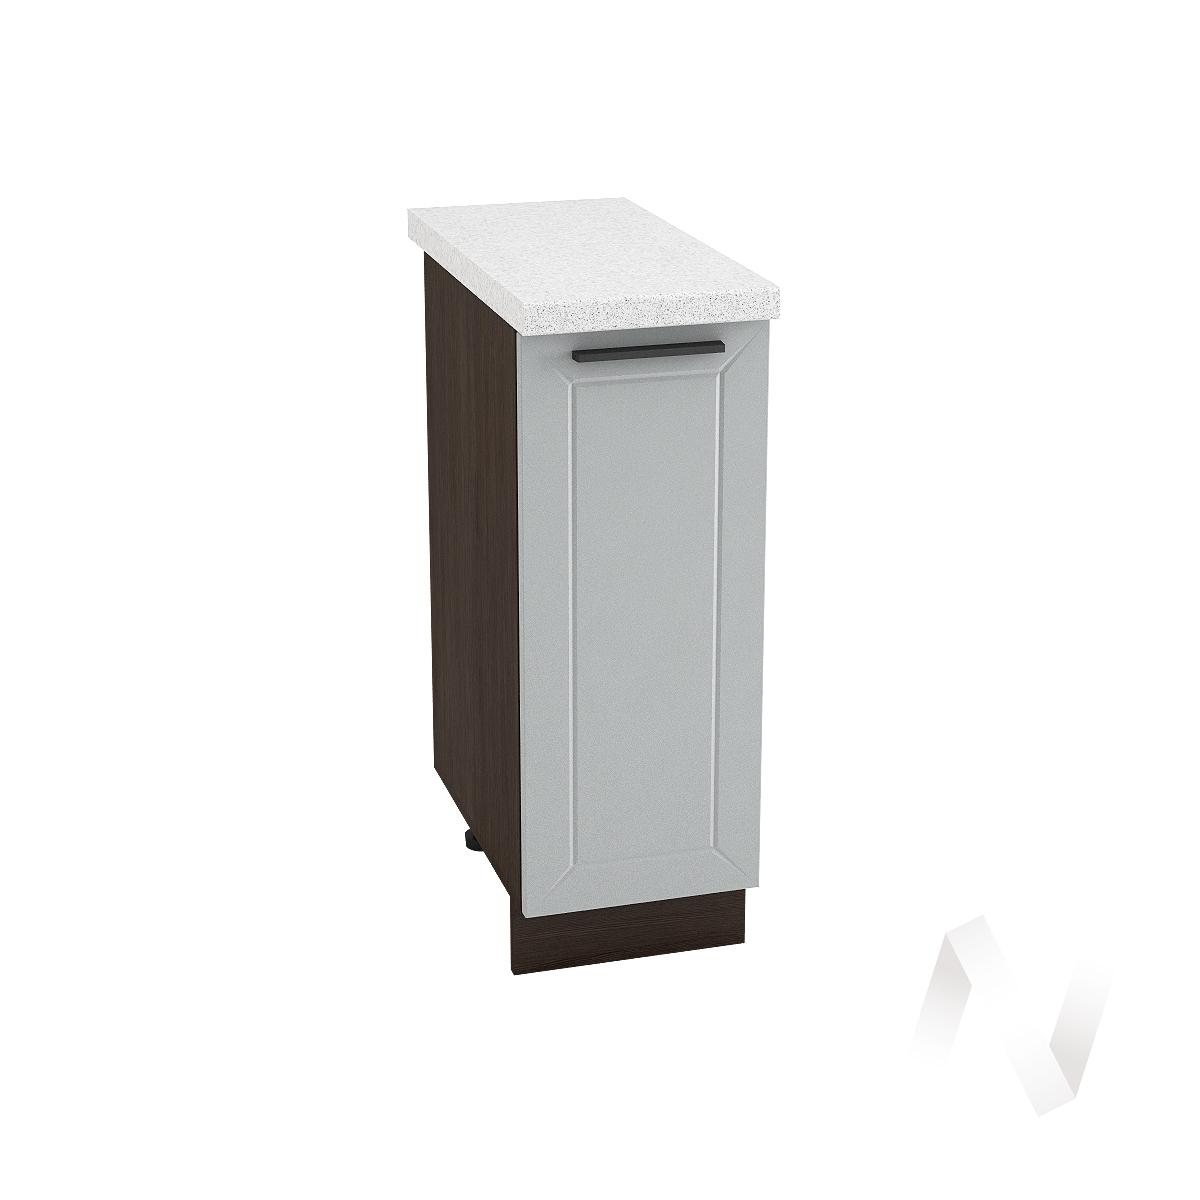 "Кухня ""Глетчер"": Шкаф нижний 300, ШН 300 (Гейнсборо силк/корпус венге)"